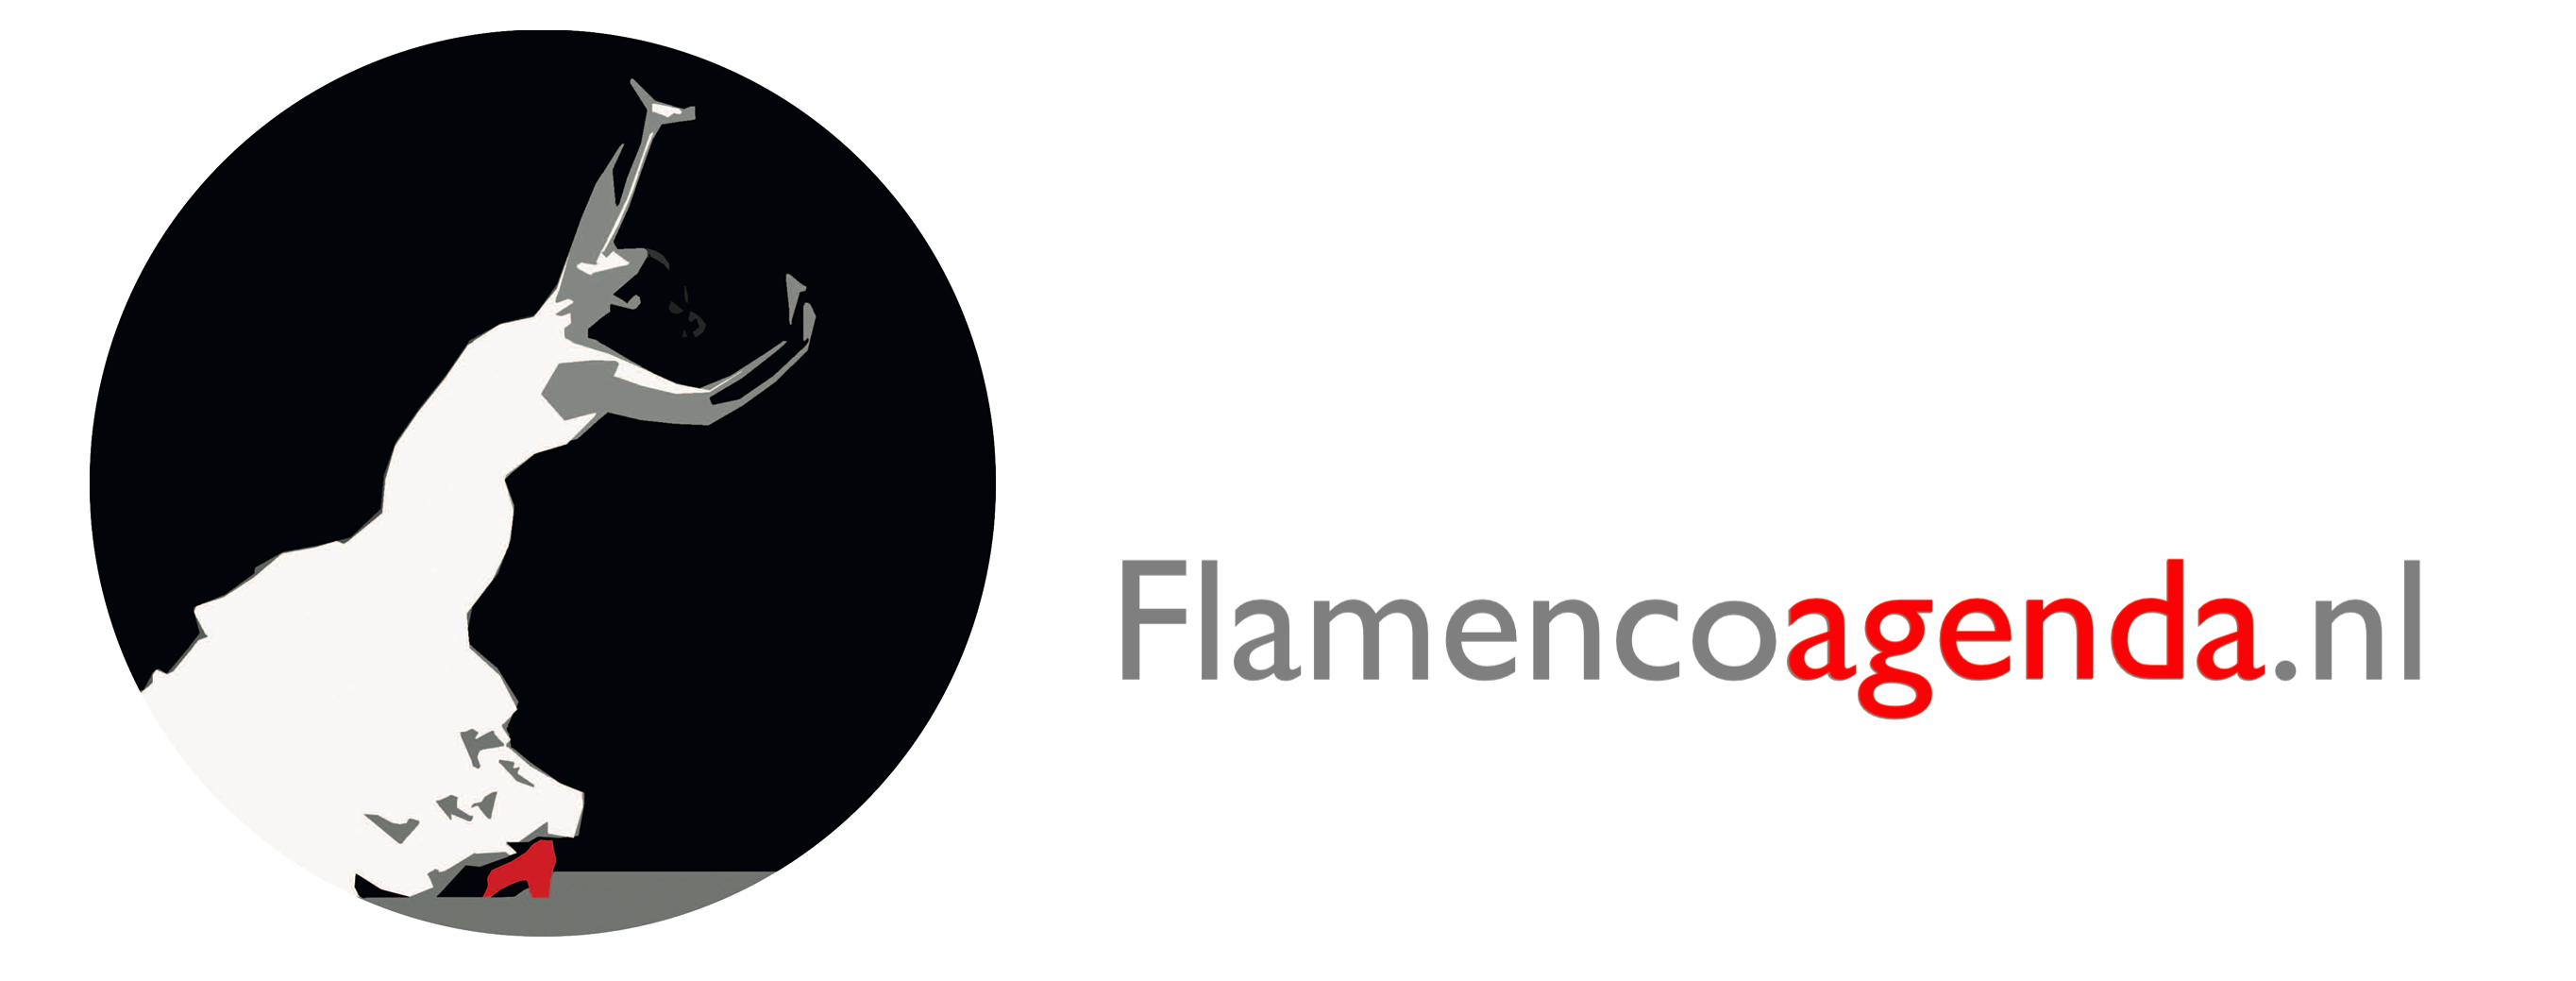 flamencoagenda.nl